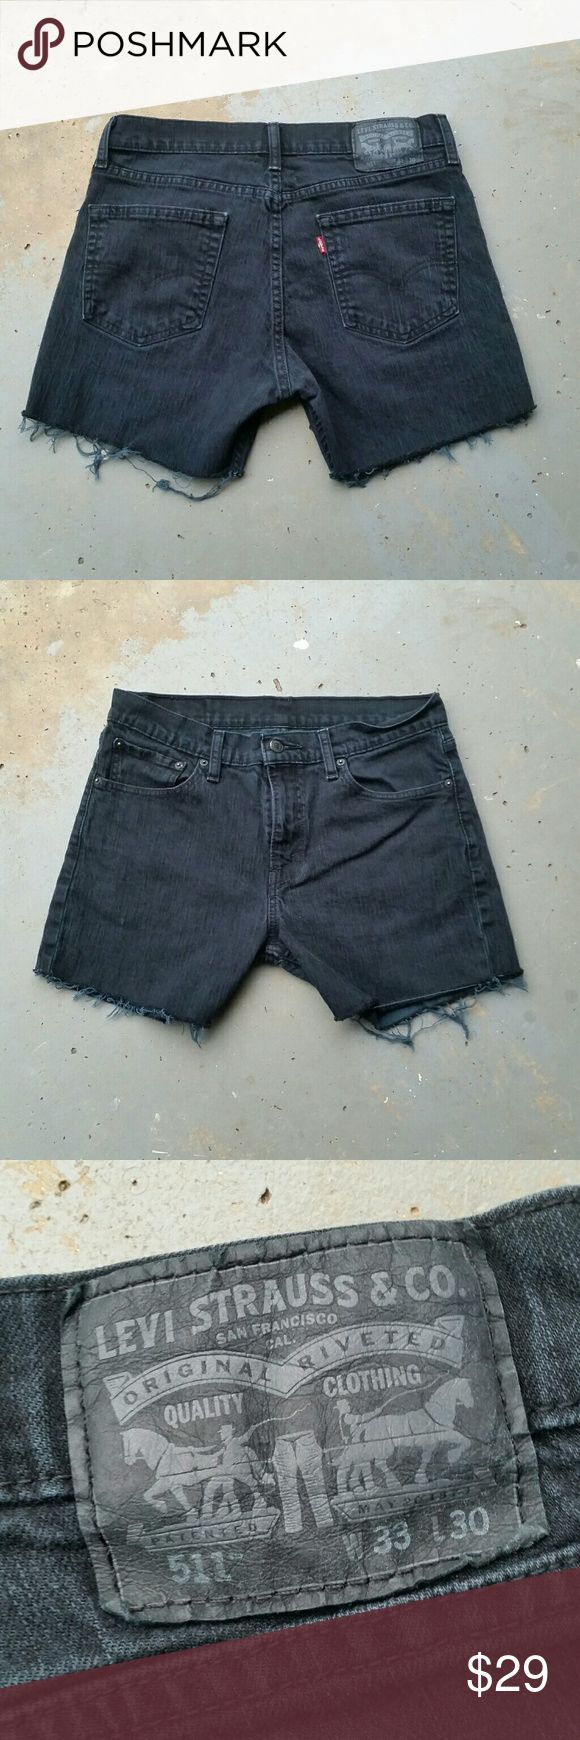 "LEVI'S 511 HIGH WAIST BLACK CUT OFF JEAN SHORTS Levi's 511 high waist black cut off jean shorts. 99% cotton.  1% elastane. 31"" waist.  10"" rise.  4"" inseam.  (#502) Levi's  Shorts Jean Shorts"